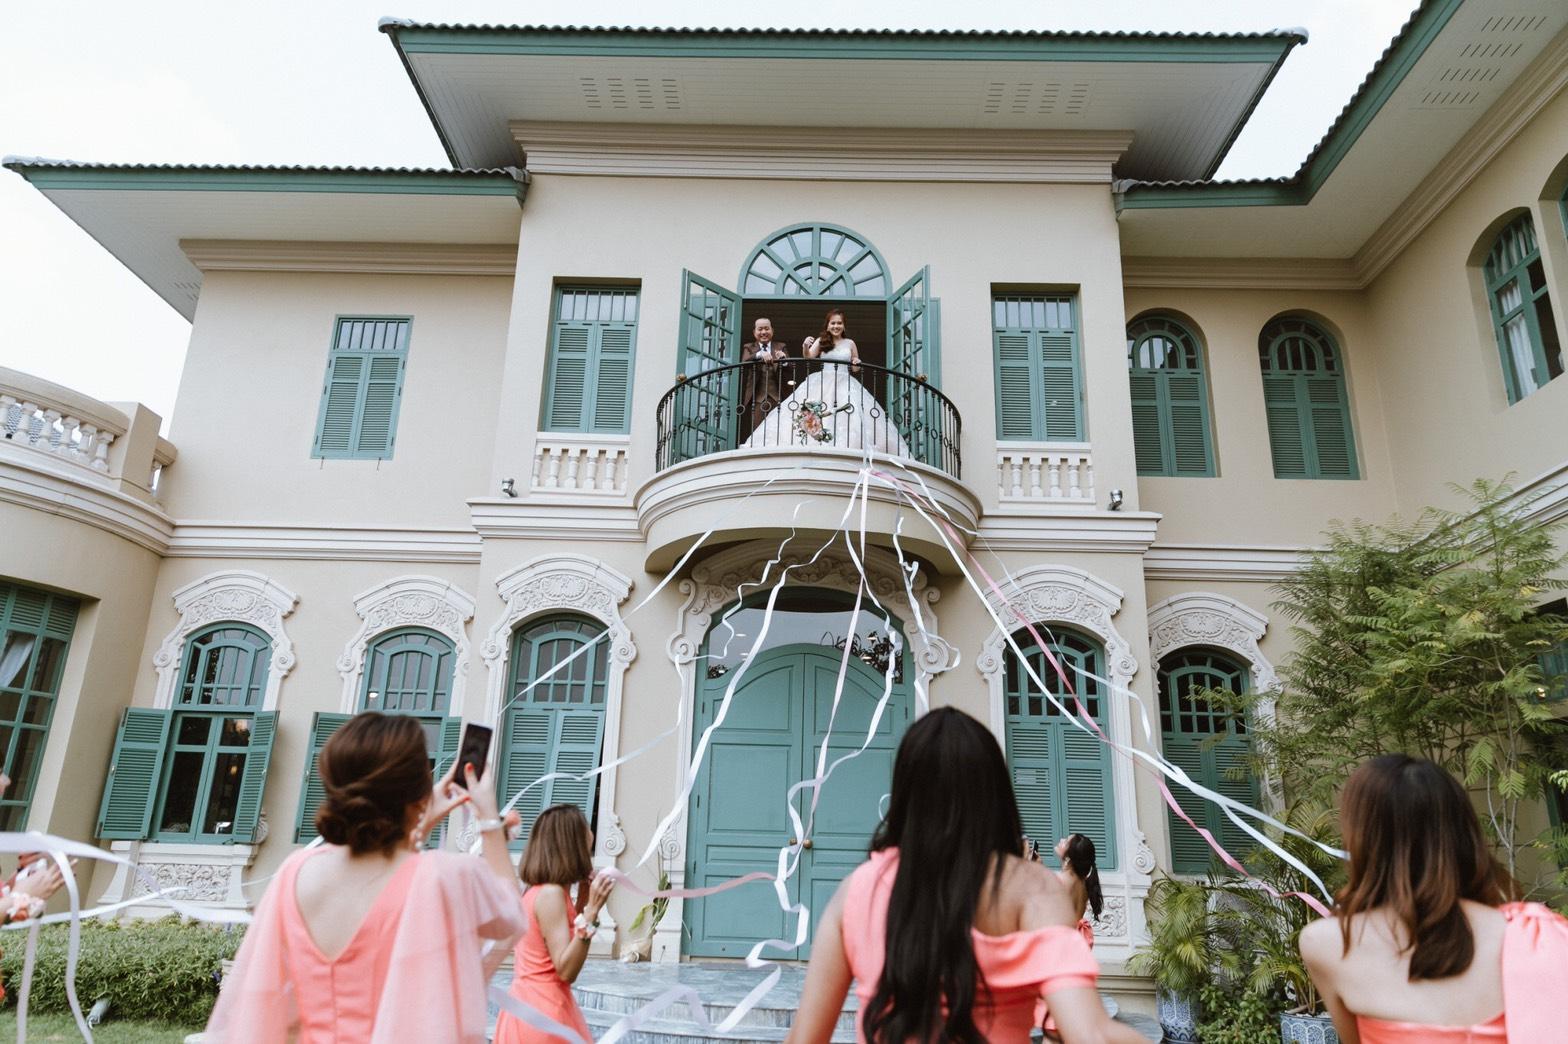 undefined รับข้อเสนอพิเศษ จัดเต็มกว่าเดิม Exclusive เฉพาะในงาน  Villa De Bua Open House 2020 เท่านั้น!